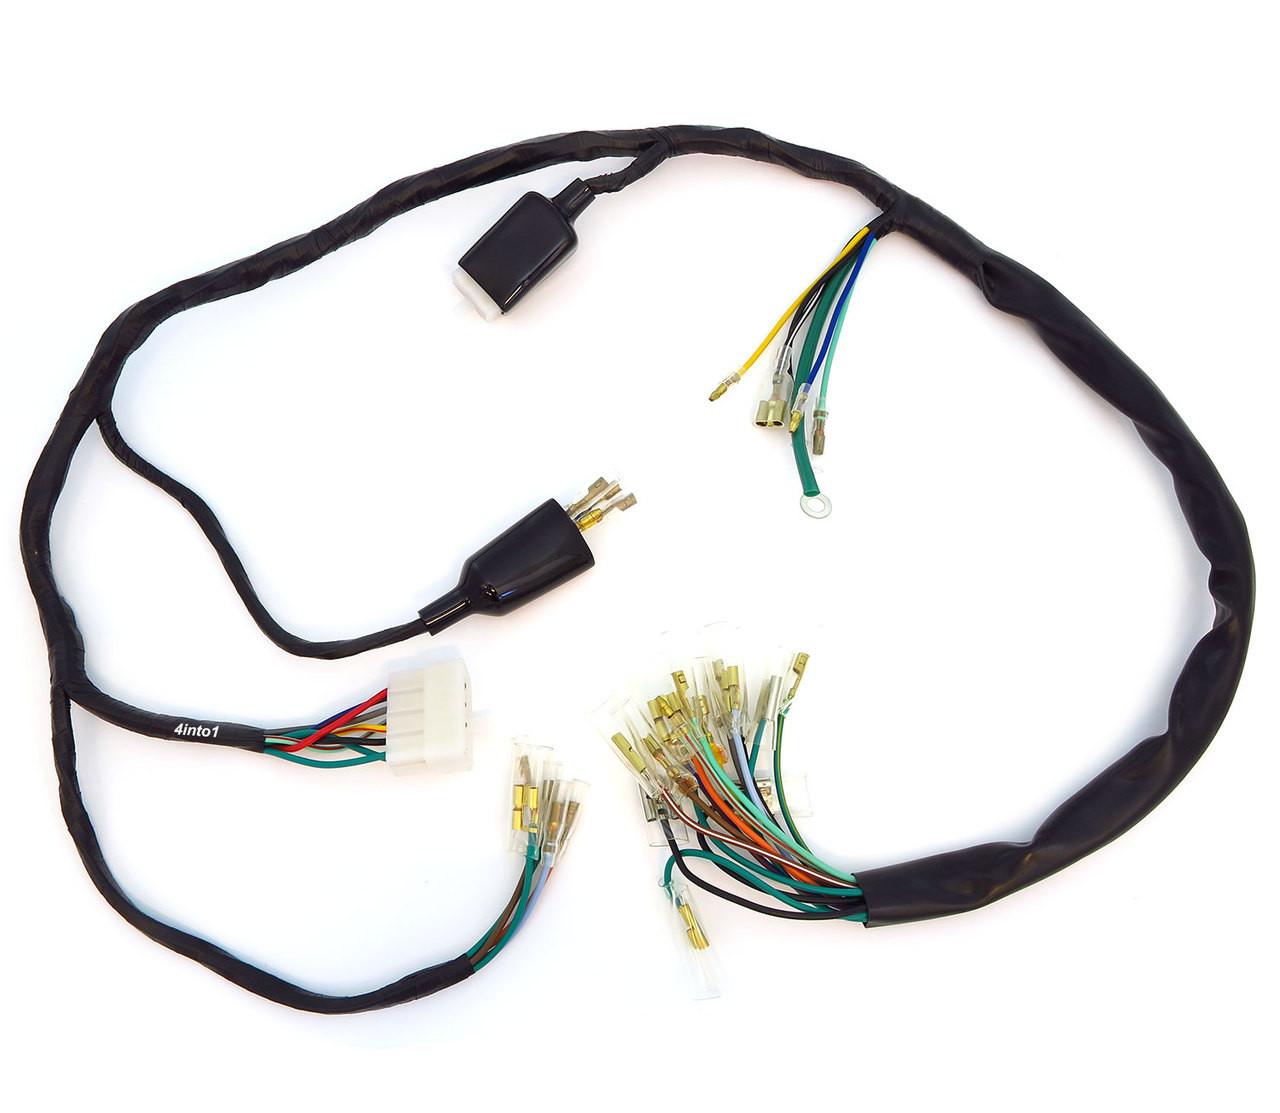 medium resolution of main wiring harness 32100 323 040 honda cb500k 1972 1973 honda ignition coil honda wiring harness